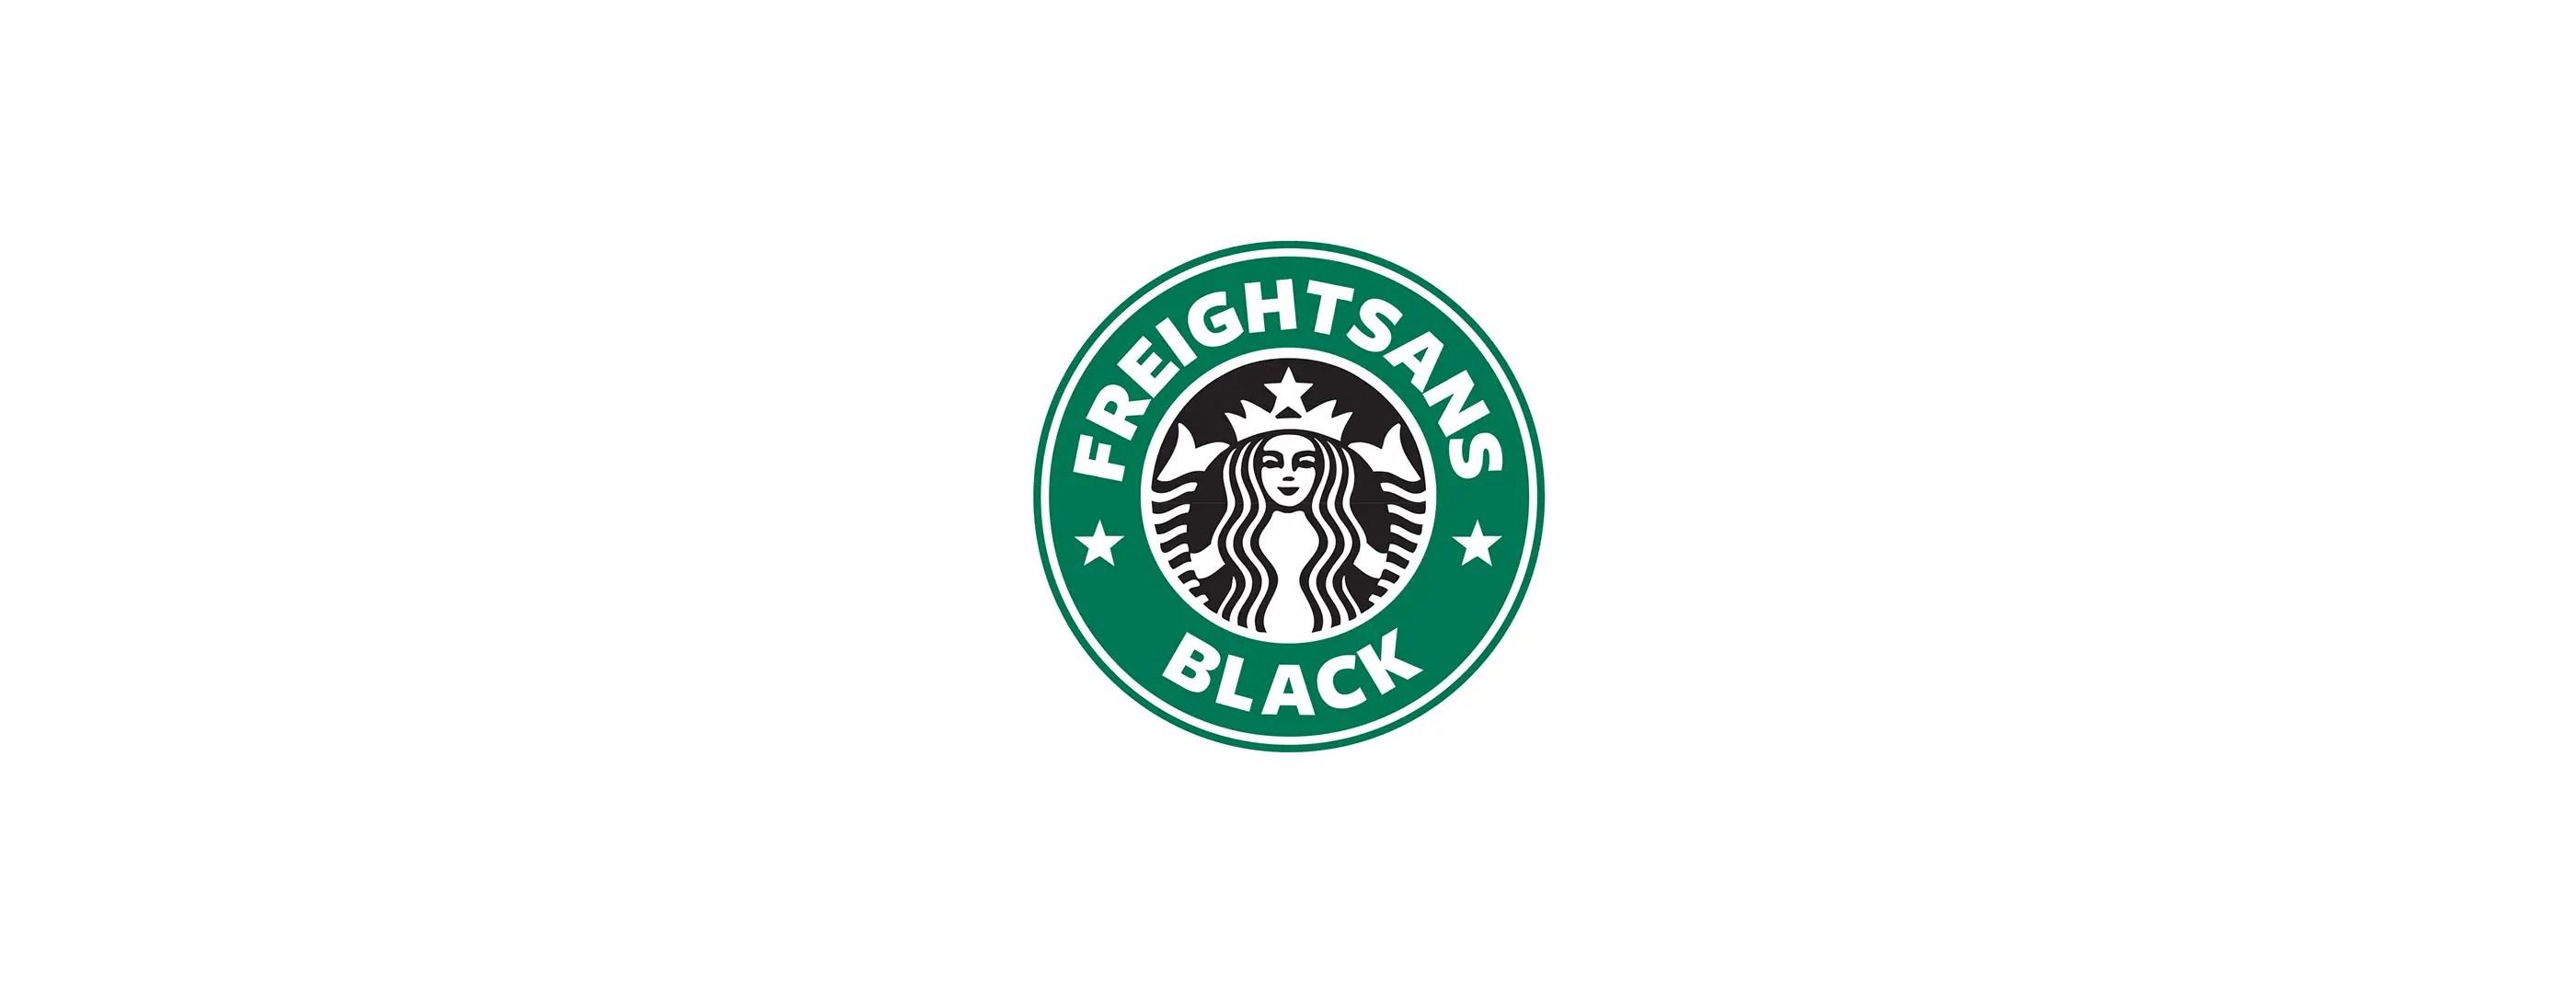 wersm-logo-font-starbucks freightsans black